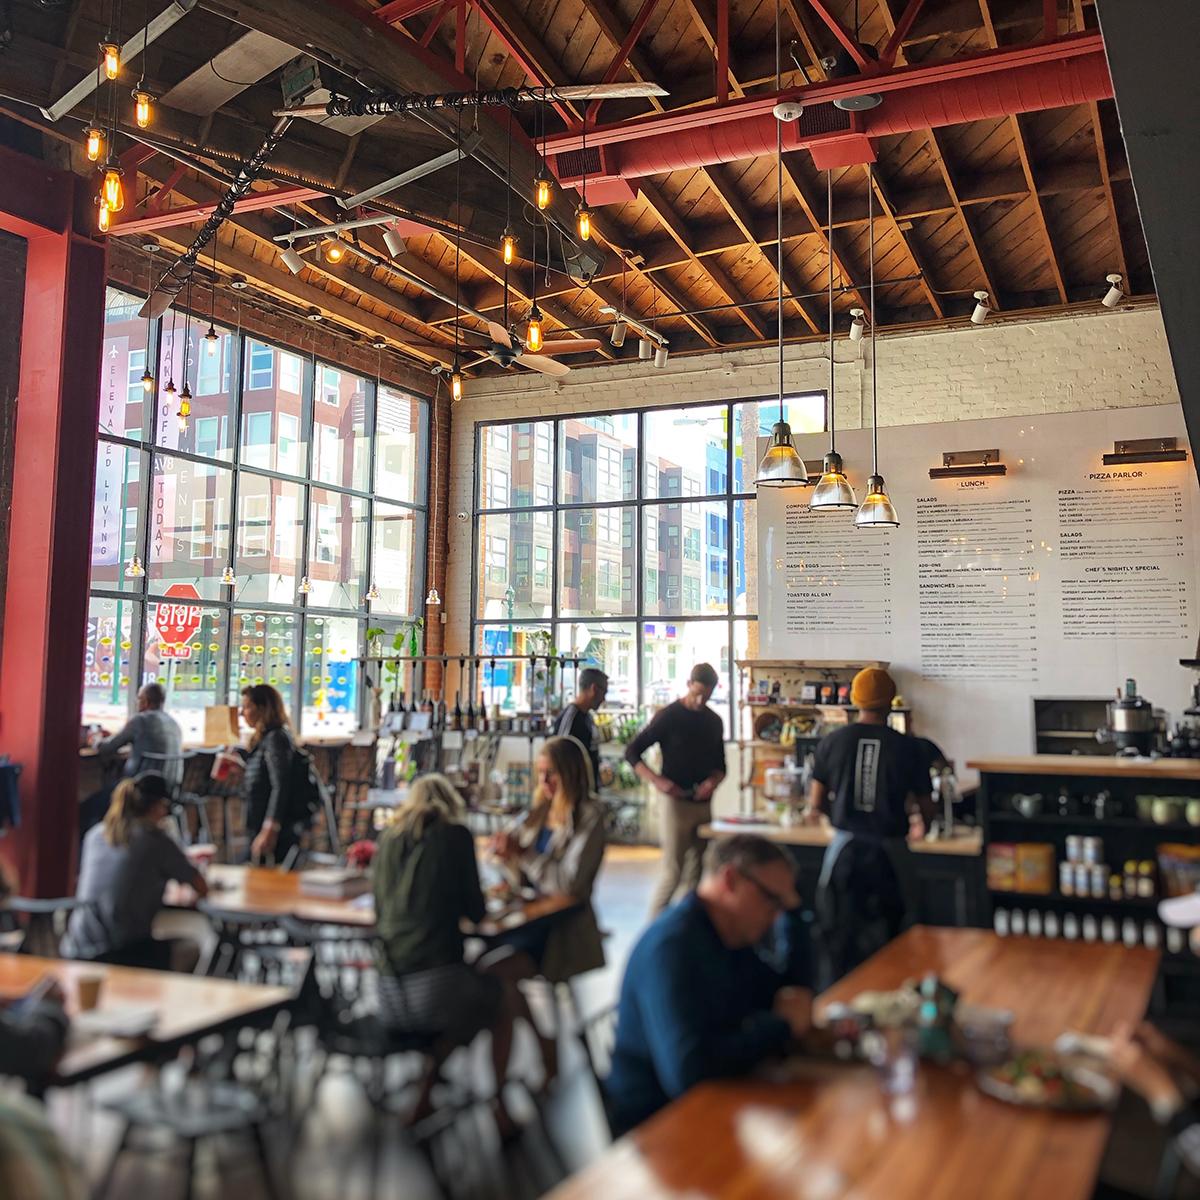 San-Diego-Restaurant-Herb-Eatery.jpeg?mtime=20190509092924#asset:105743